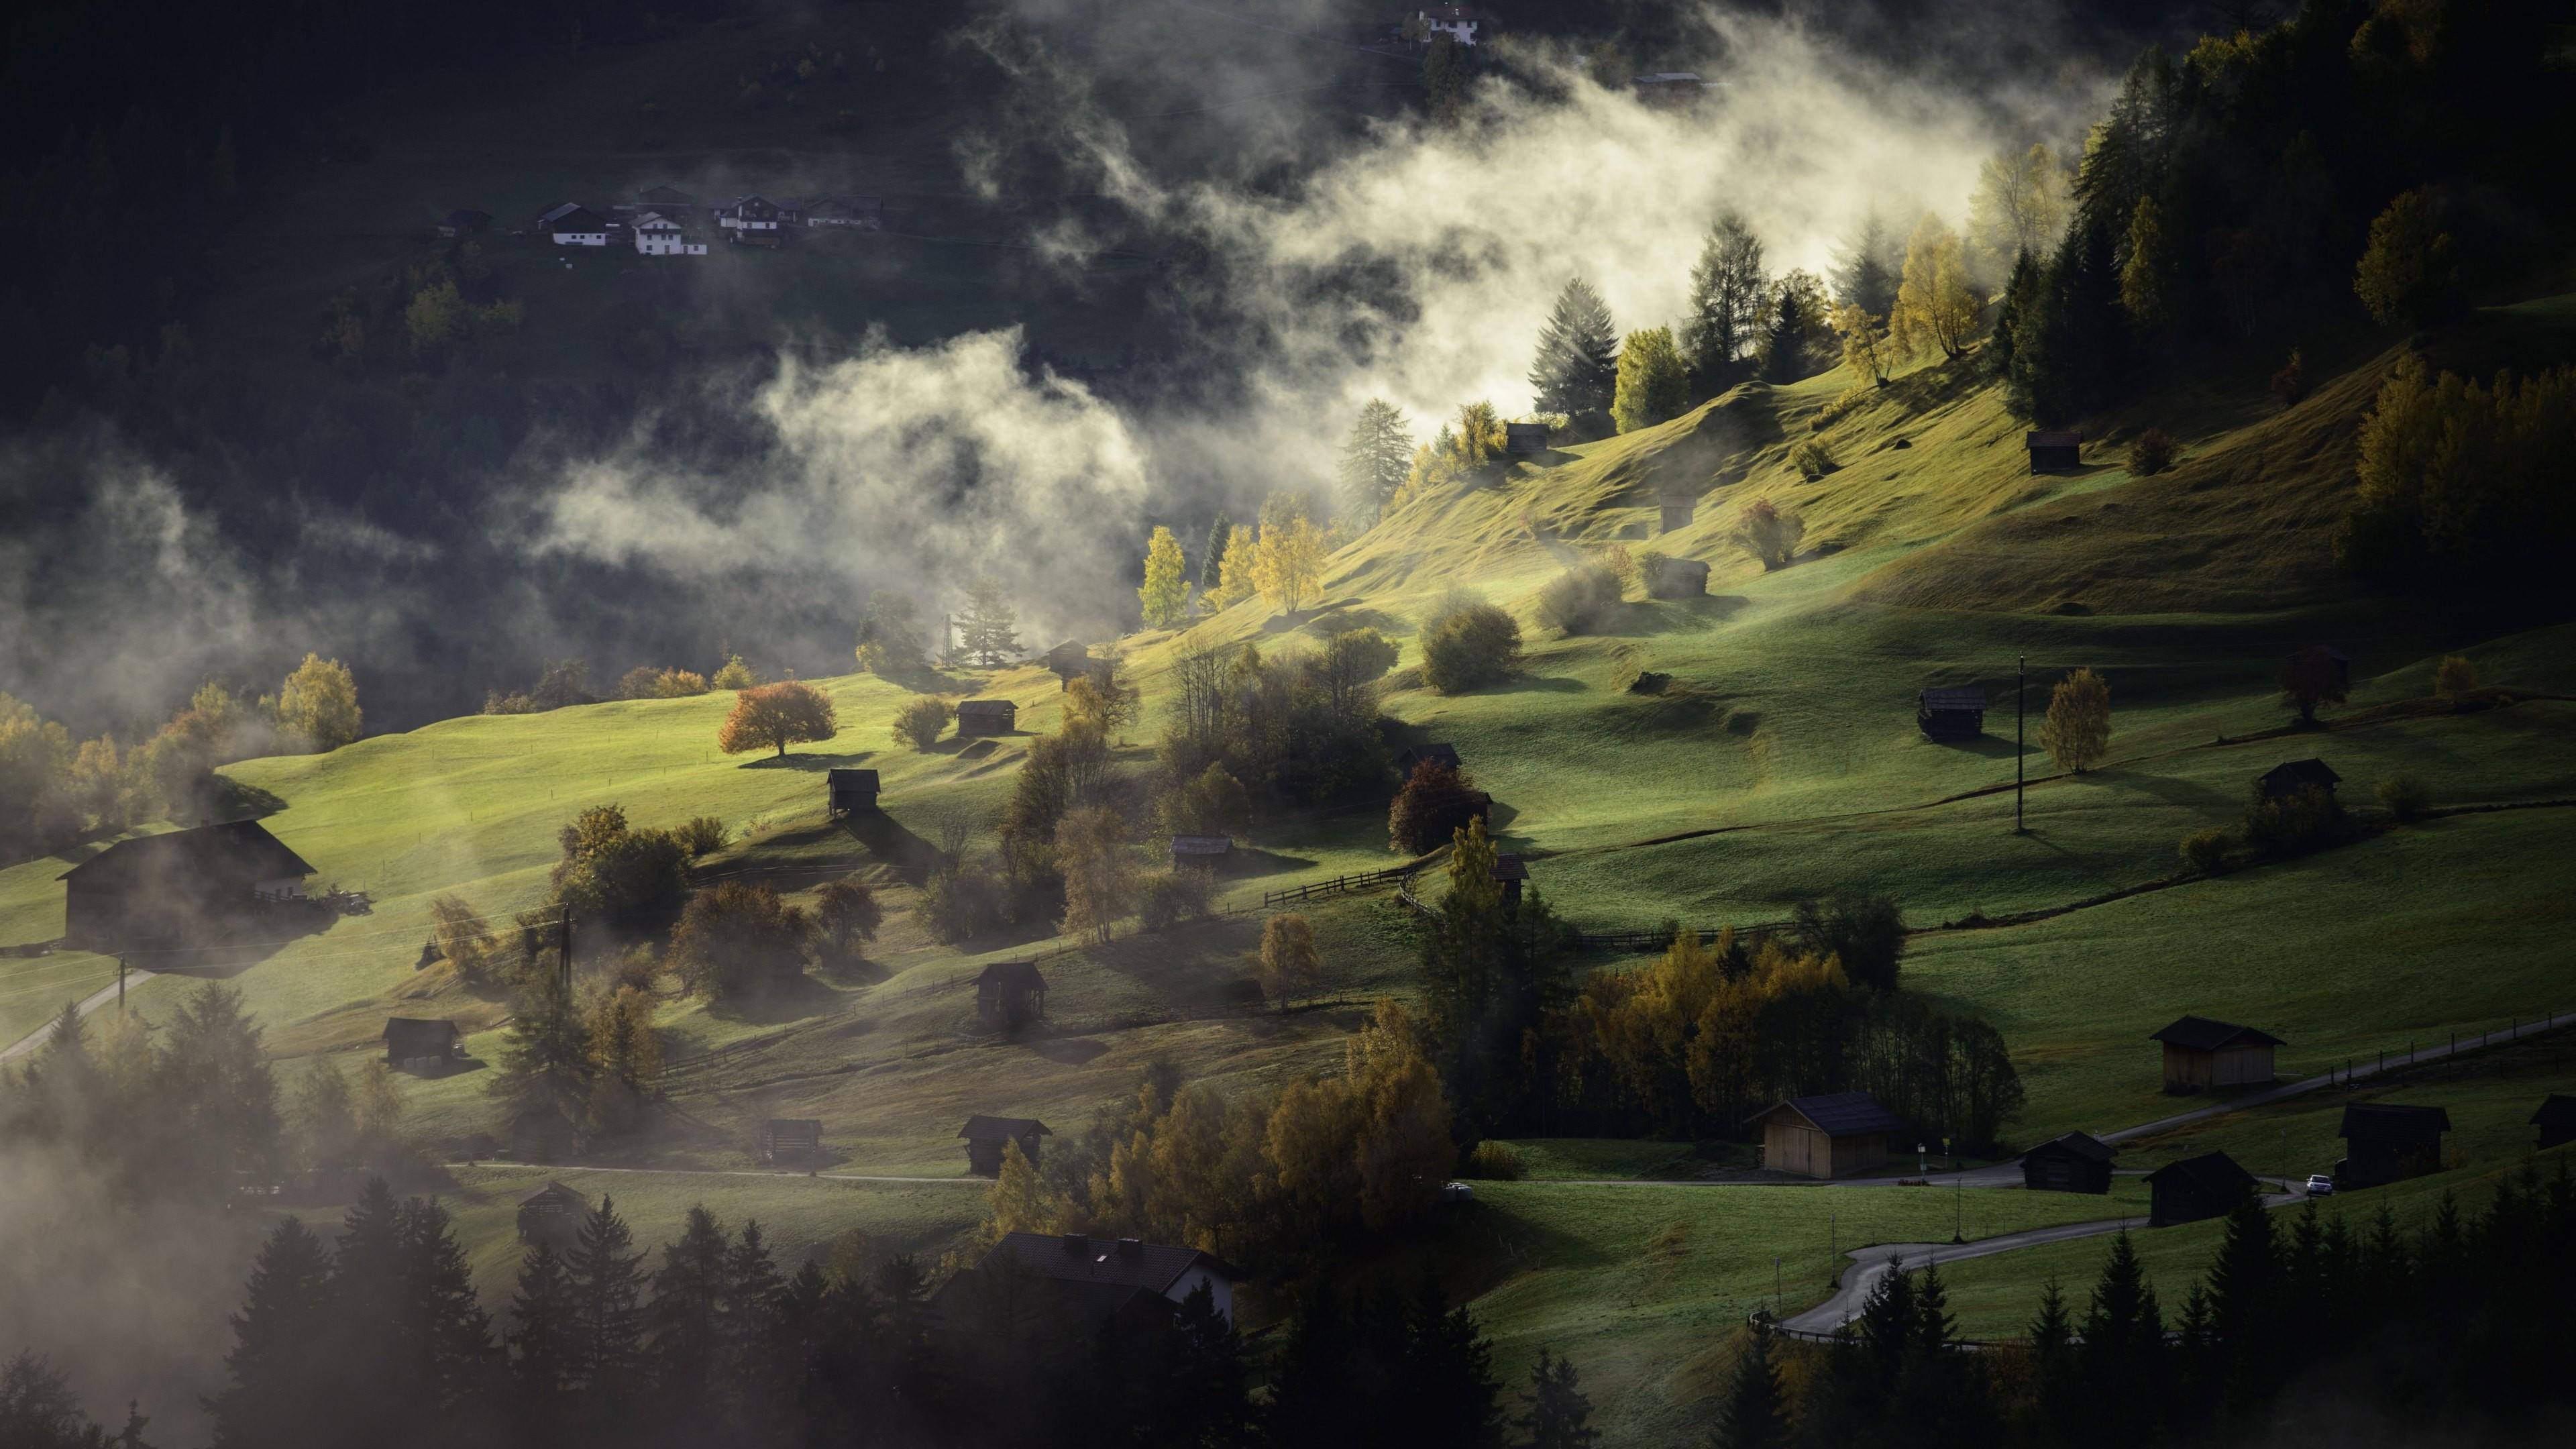 Landscape 4k Ultra Hd Wallpaper Fantasy Landscape Wallpaper 4k 3840x2160 Download Hd Wallpaper Wallpapertip